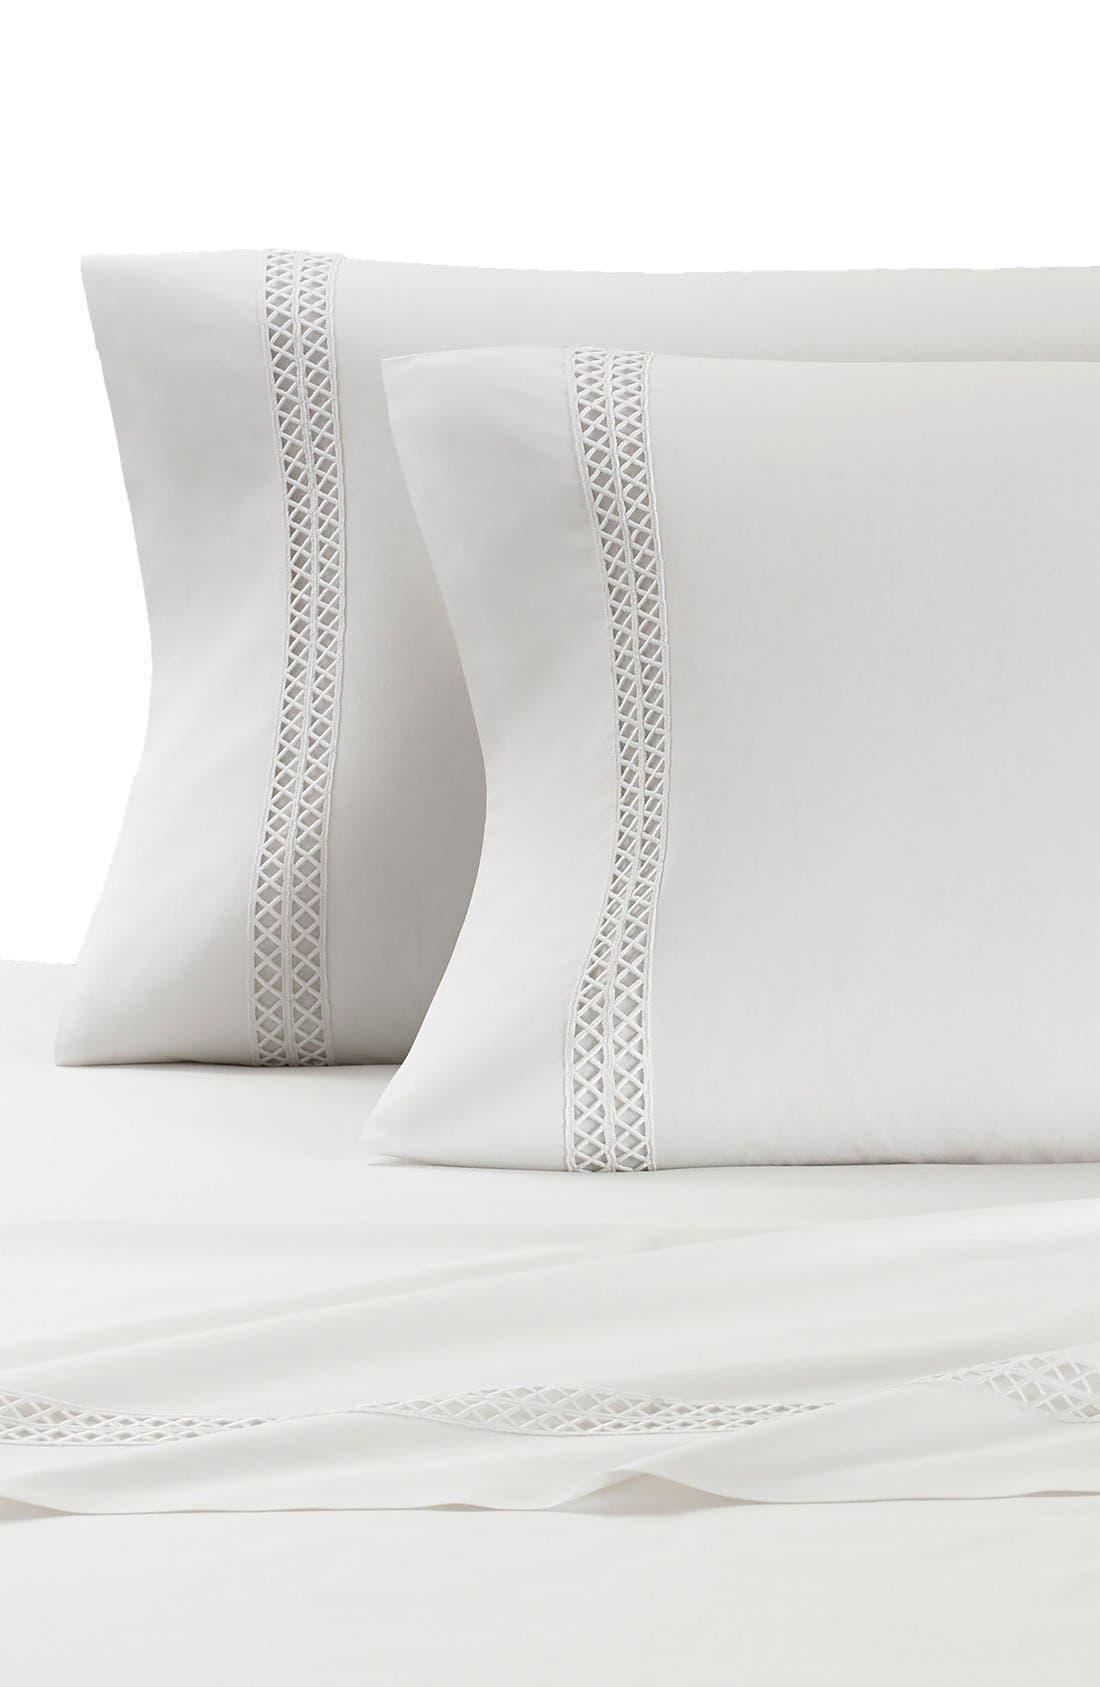 Main Image - KASSATEX Emilia Pillowcases